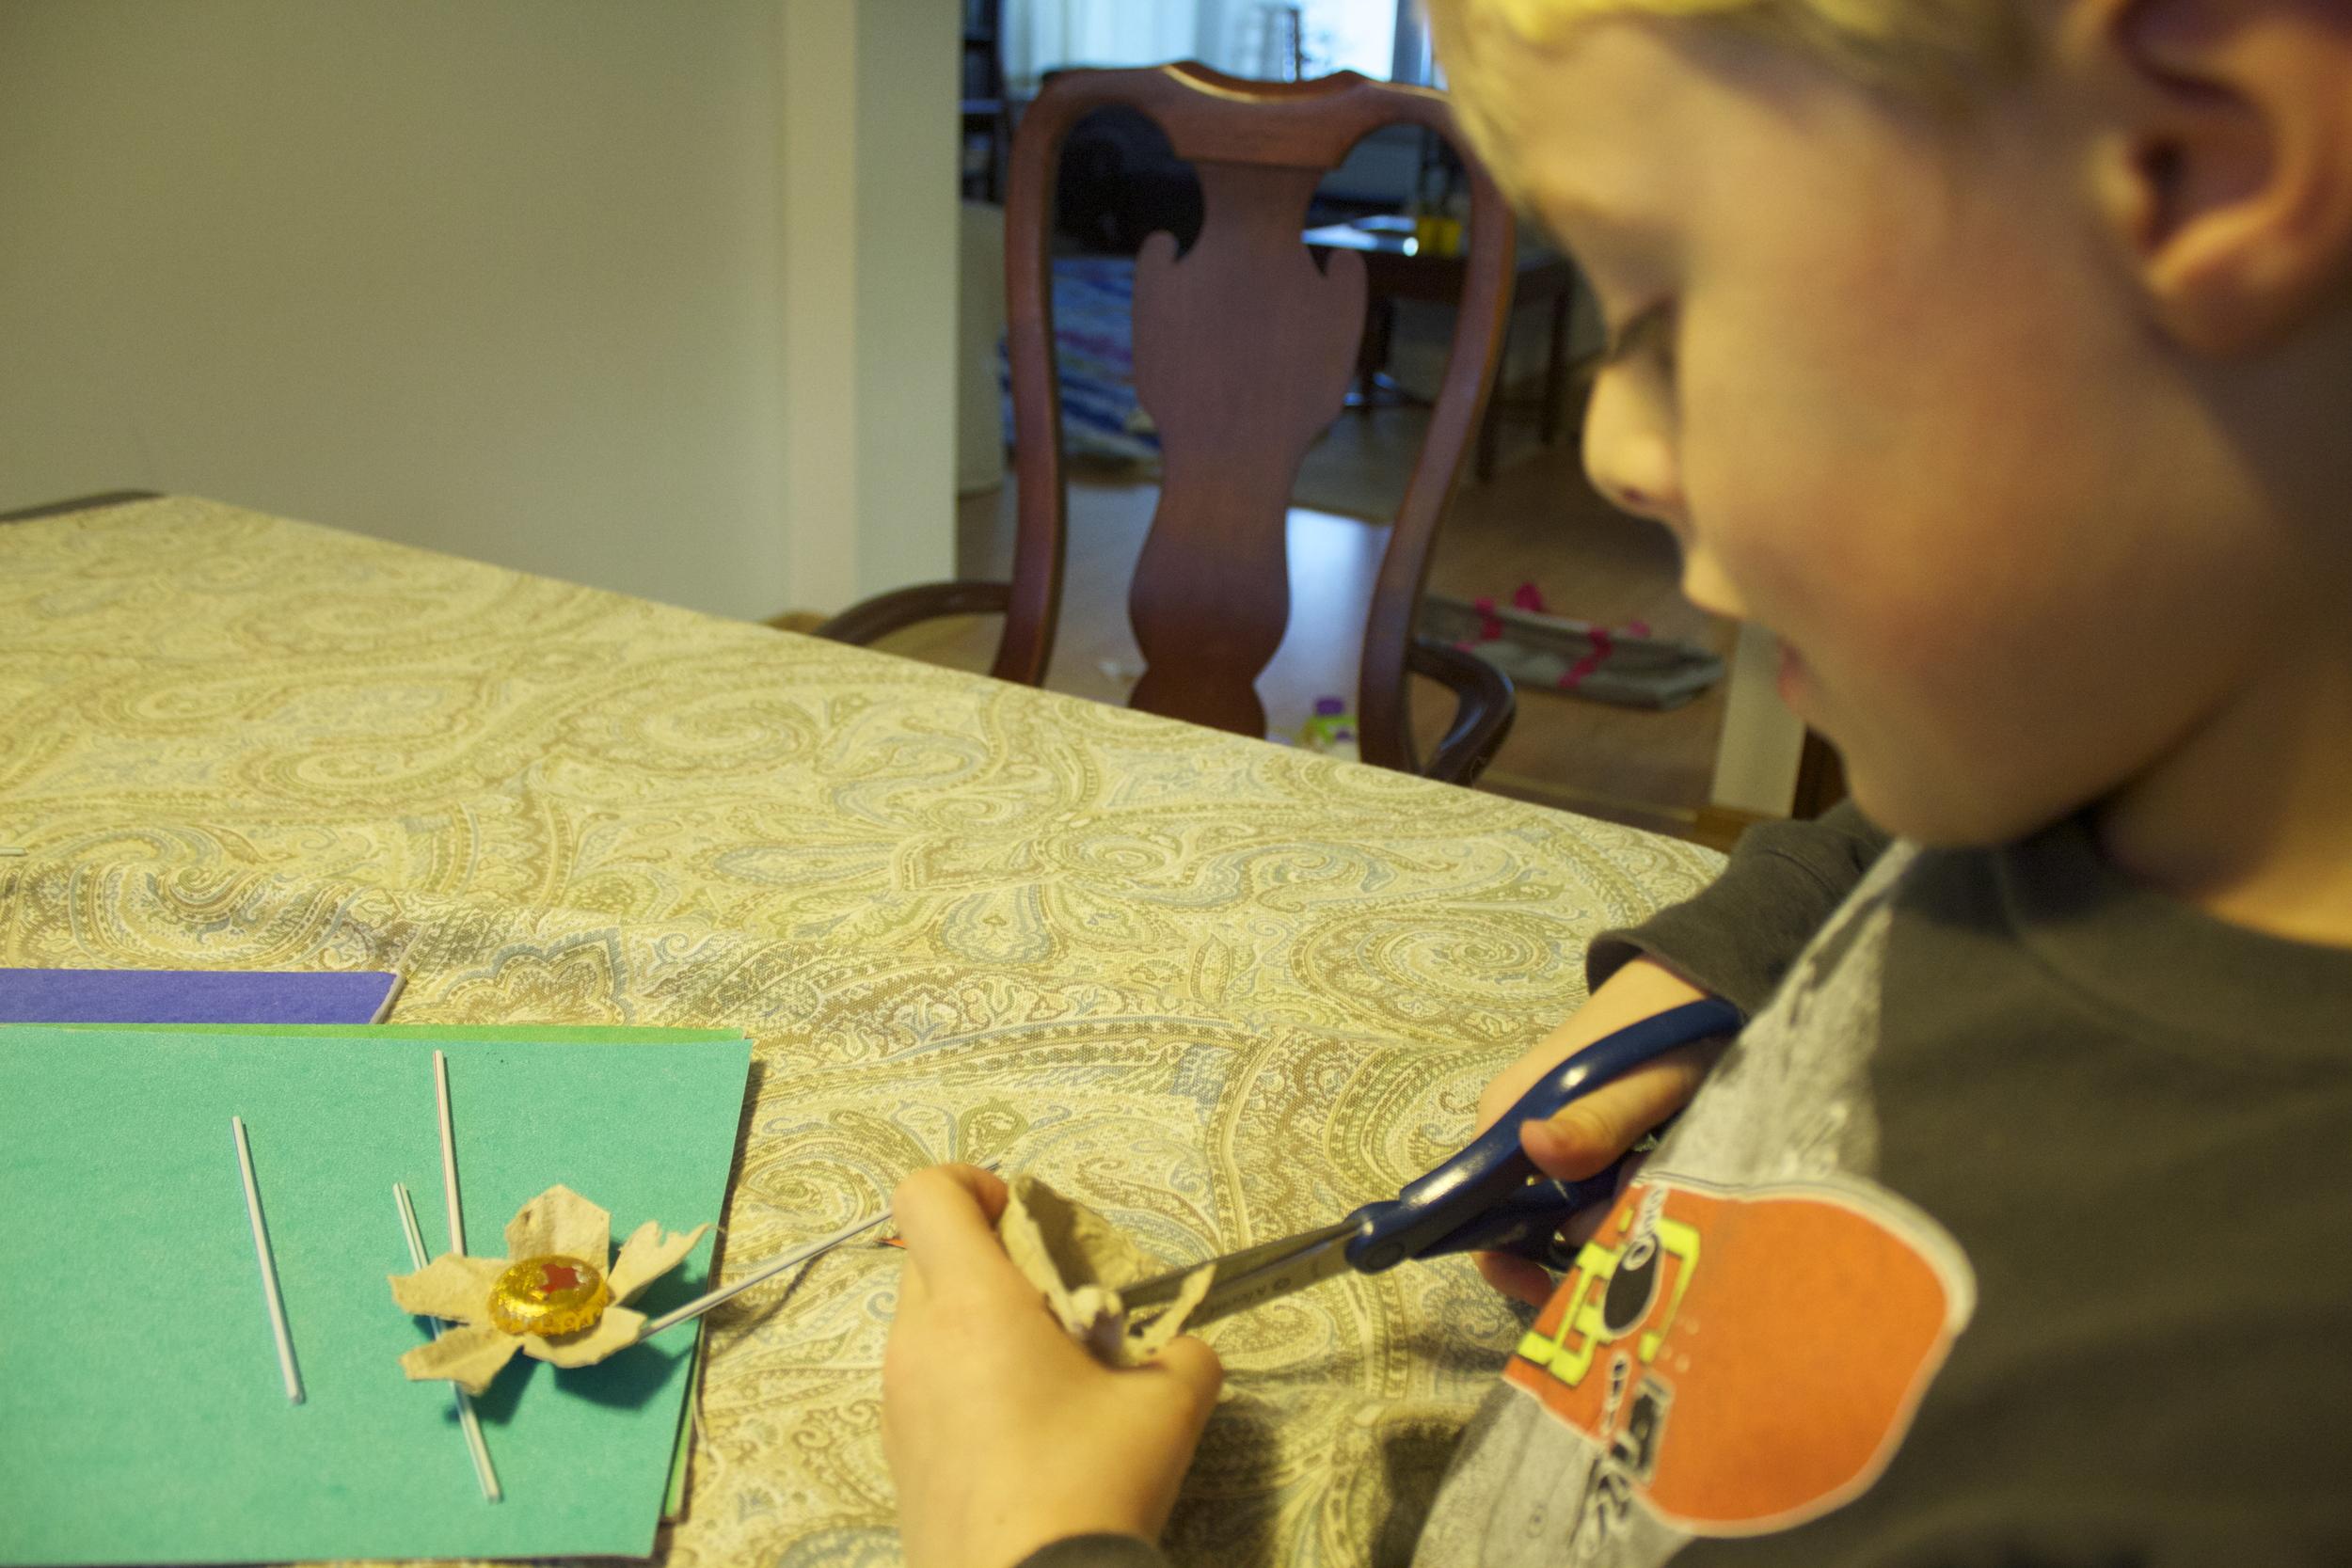 Cutting the egg carton to create the petals.